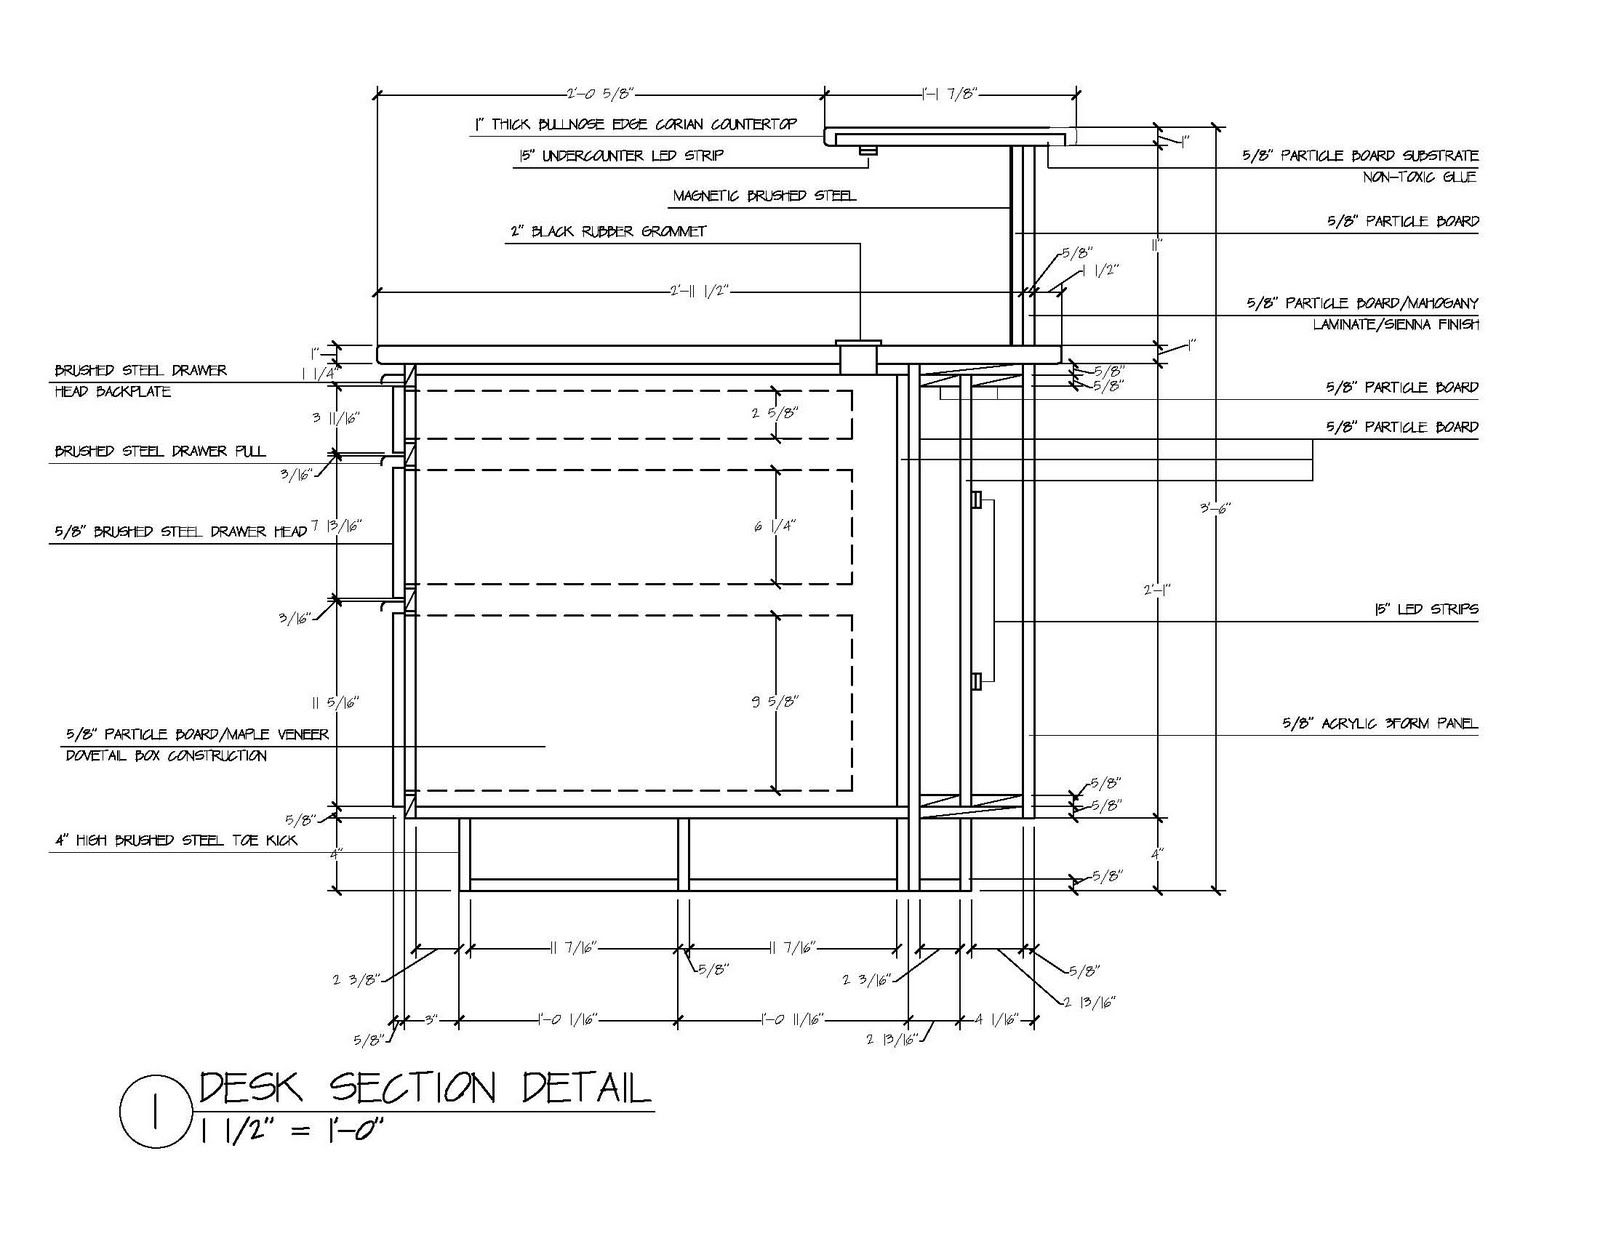 office desk design plans. Reception Desk Section Detail Office Design Plans K